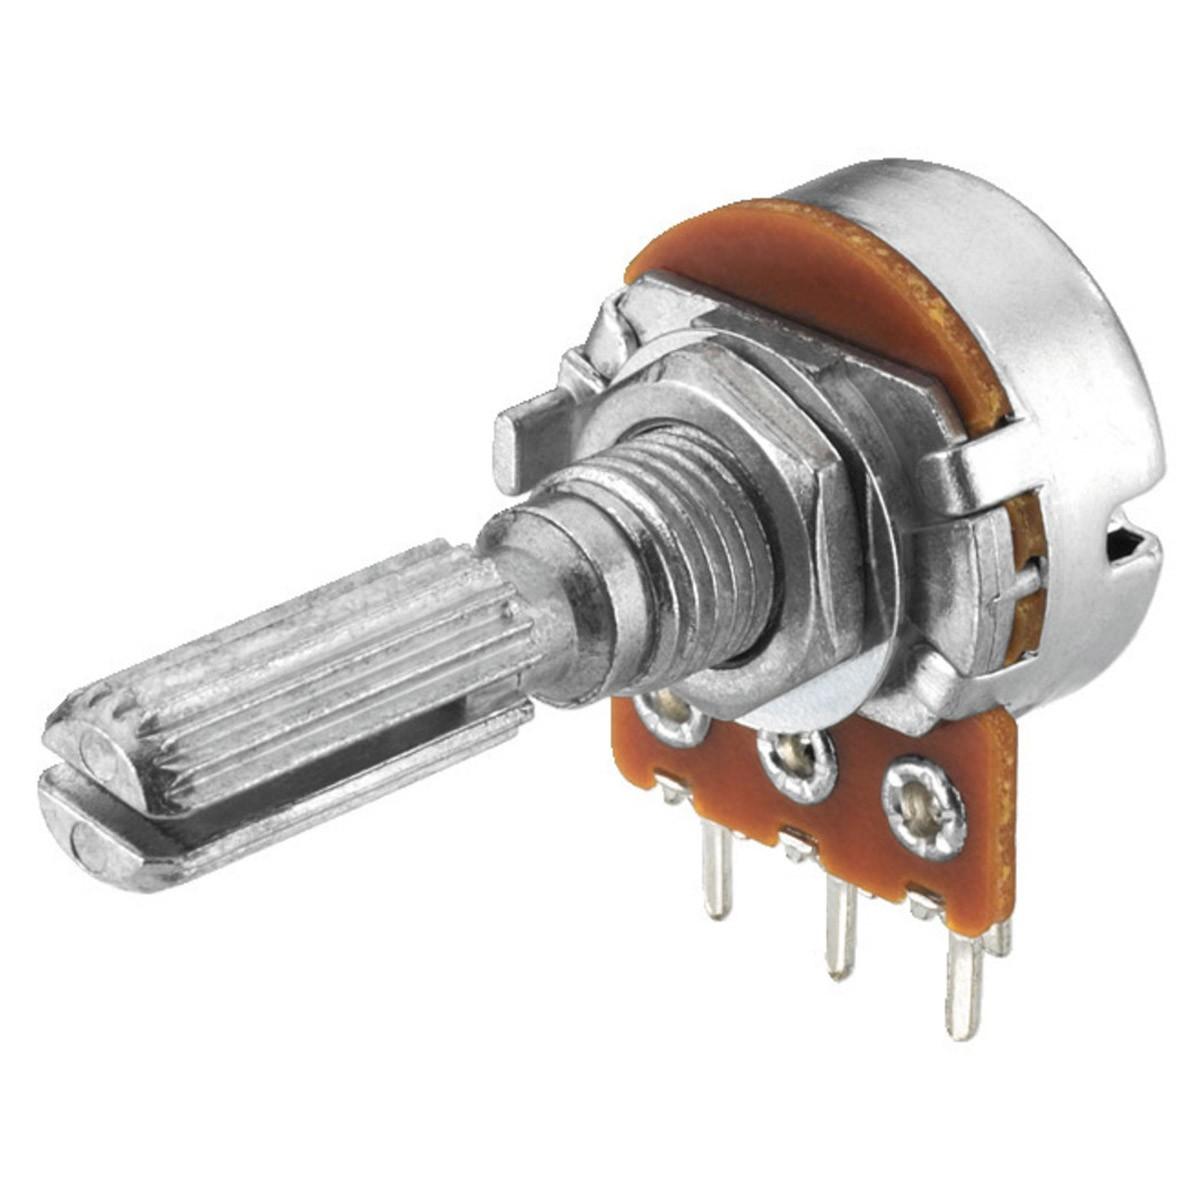 Mono potentiometer VRB-101M50 50k ohm center point